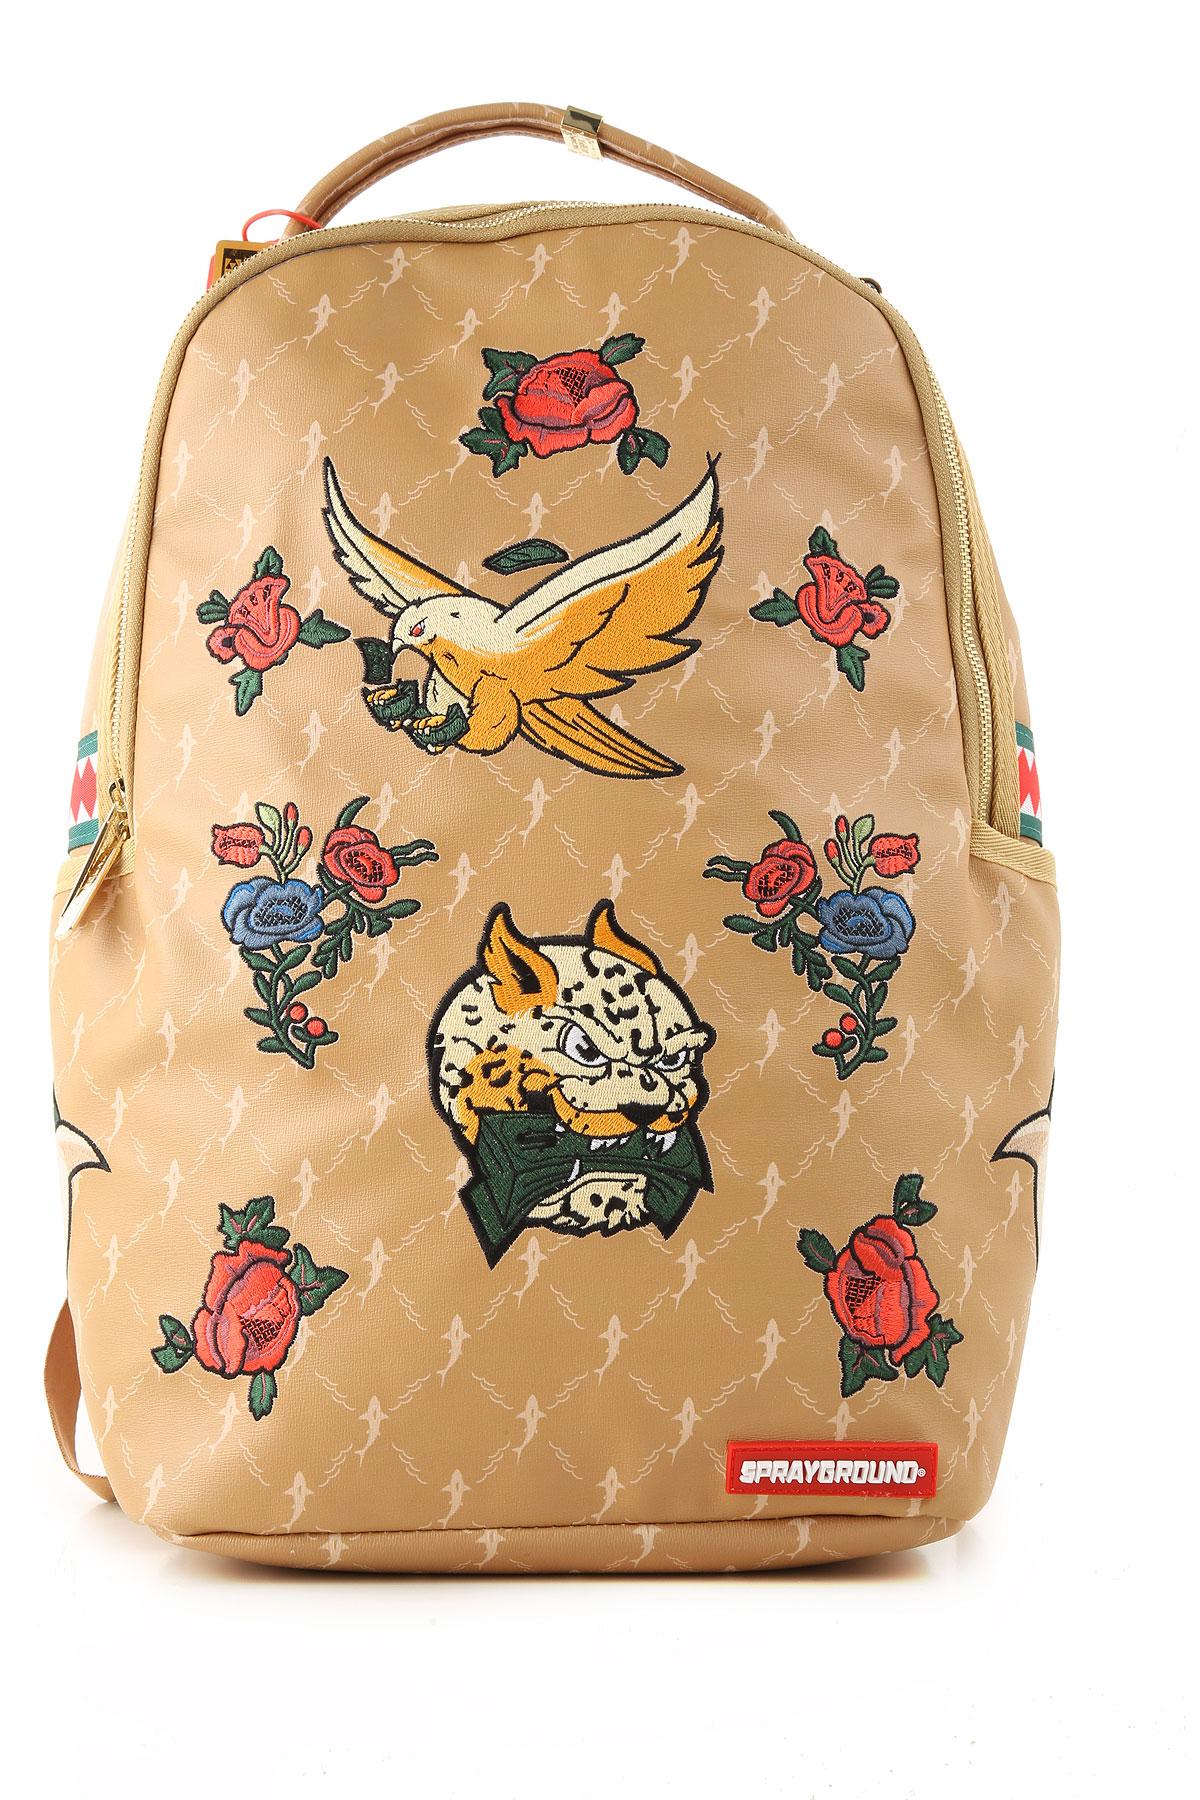 Sprayground Backpack for Men On Sale, Caramel, PVC, 2019